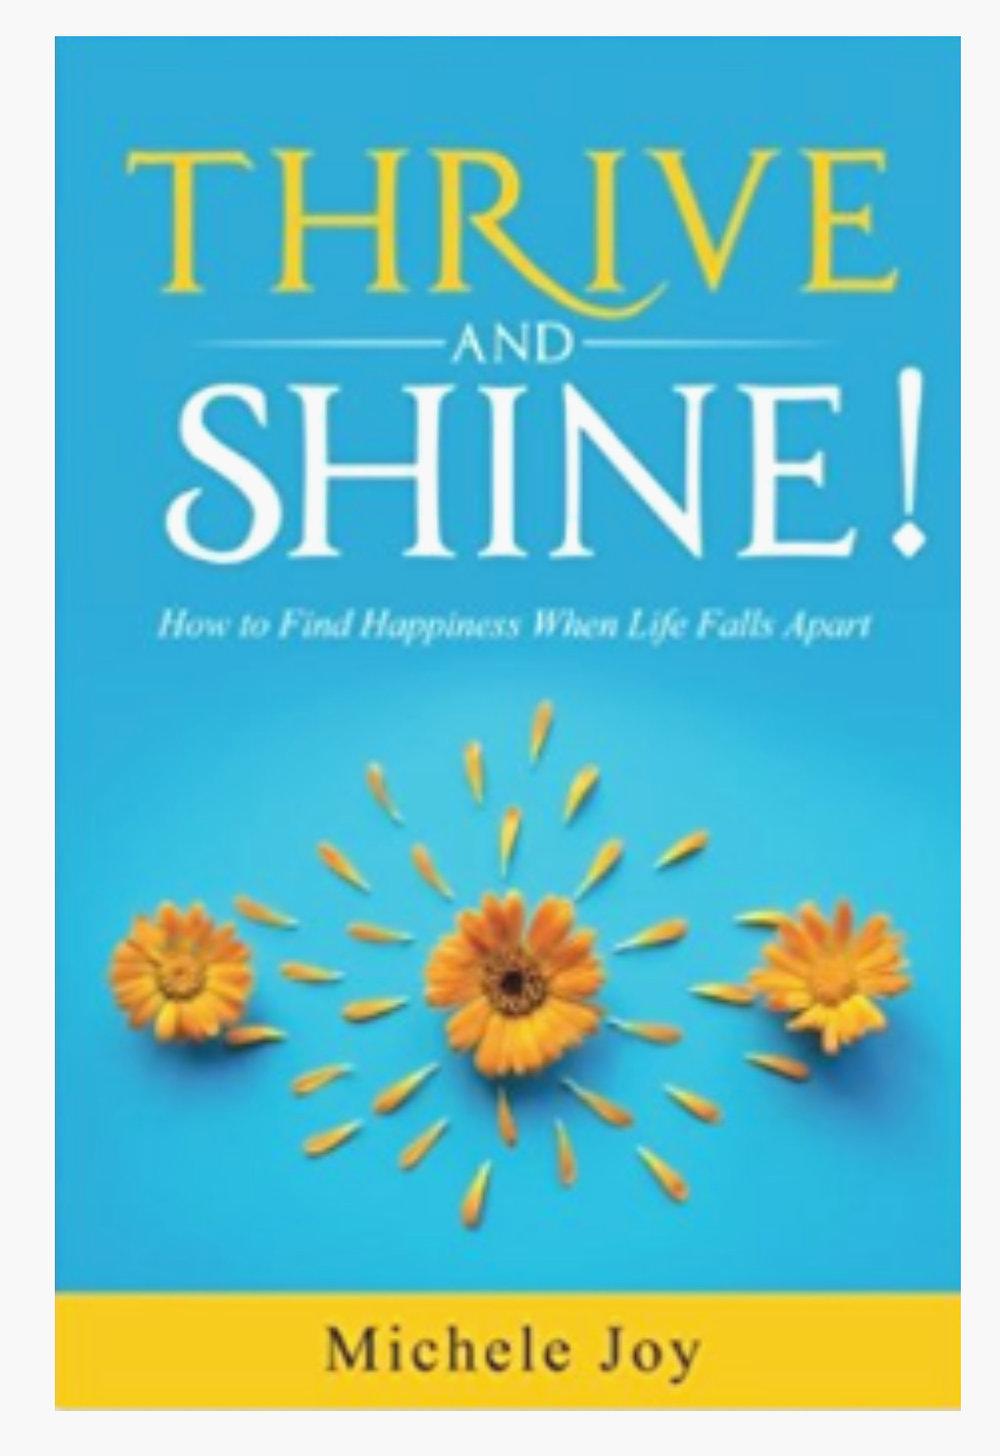 thrive+and+shine+book.jpg